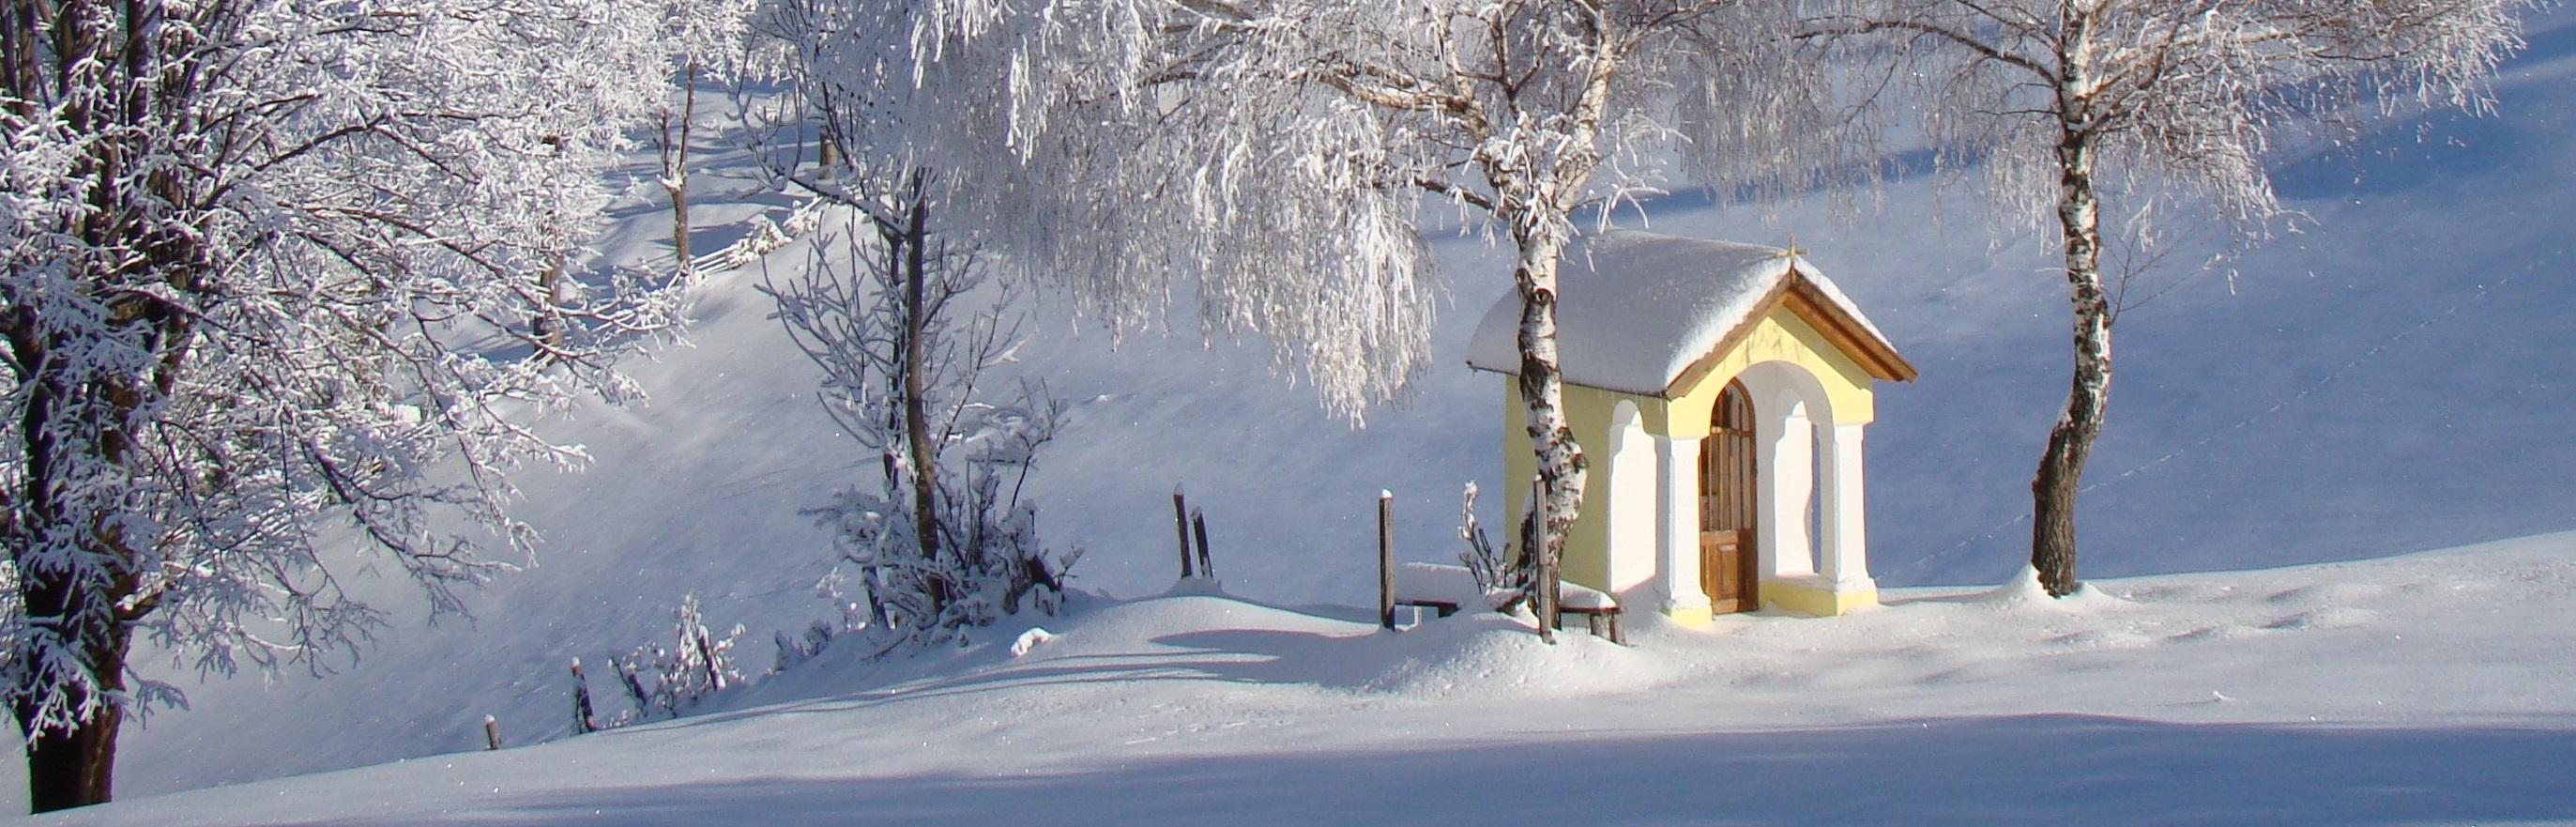 2010-01-27-fisch-04